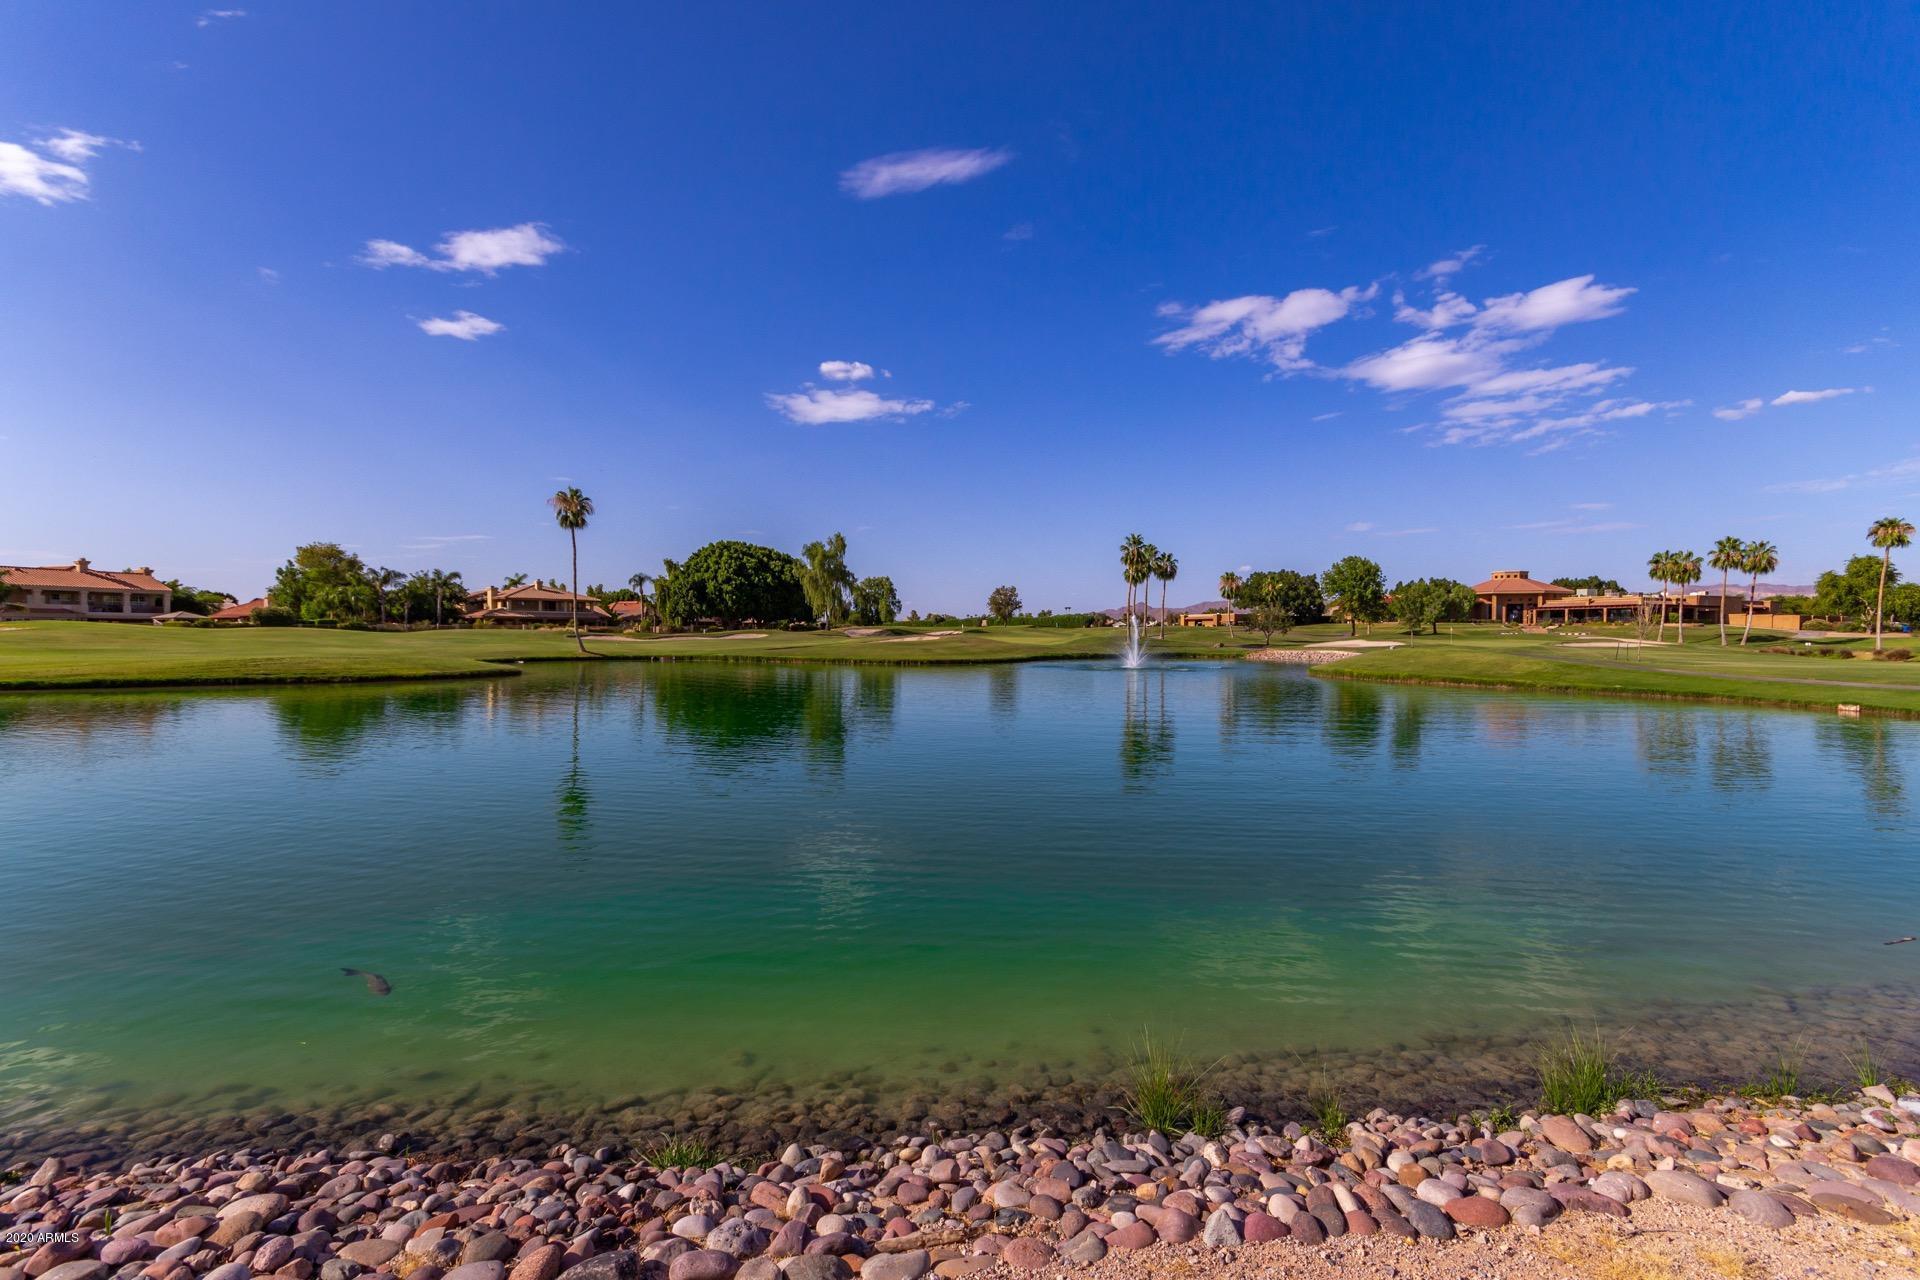 MLS 6099975 1235 N SUNNYVALE -- Unit 49, Mesa, AZ 85205 Mesa AZ Condo or Townhome